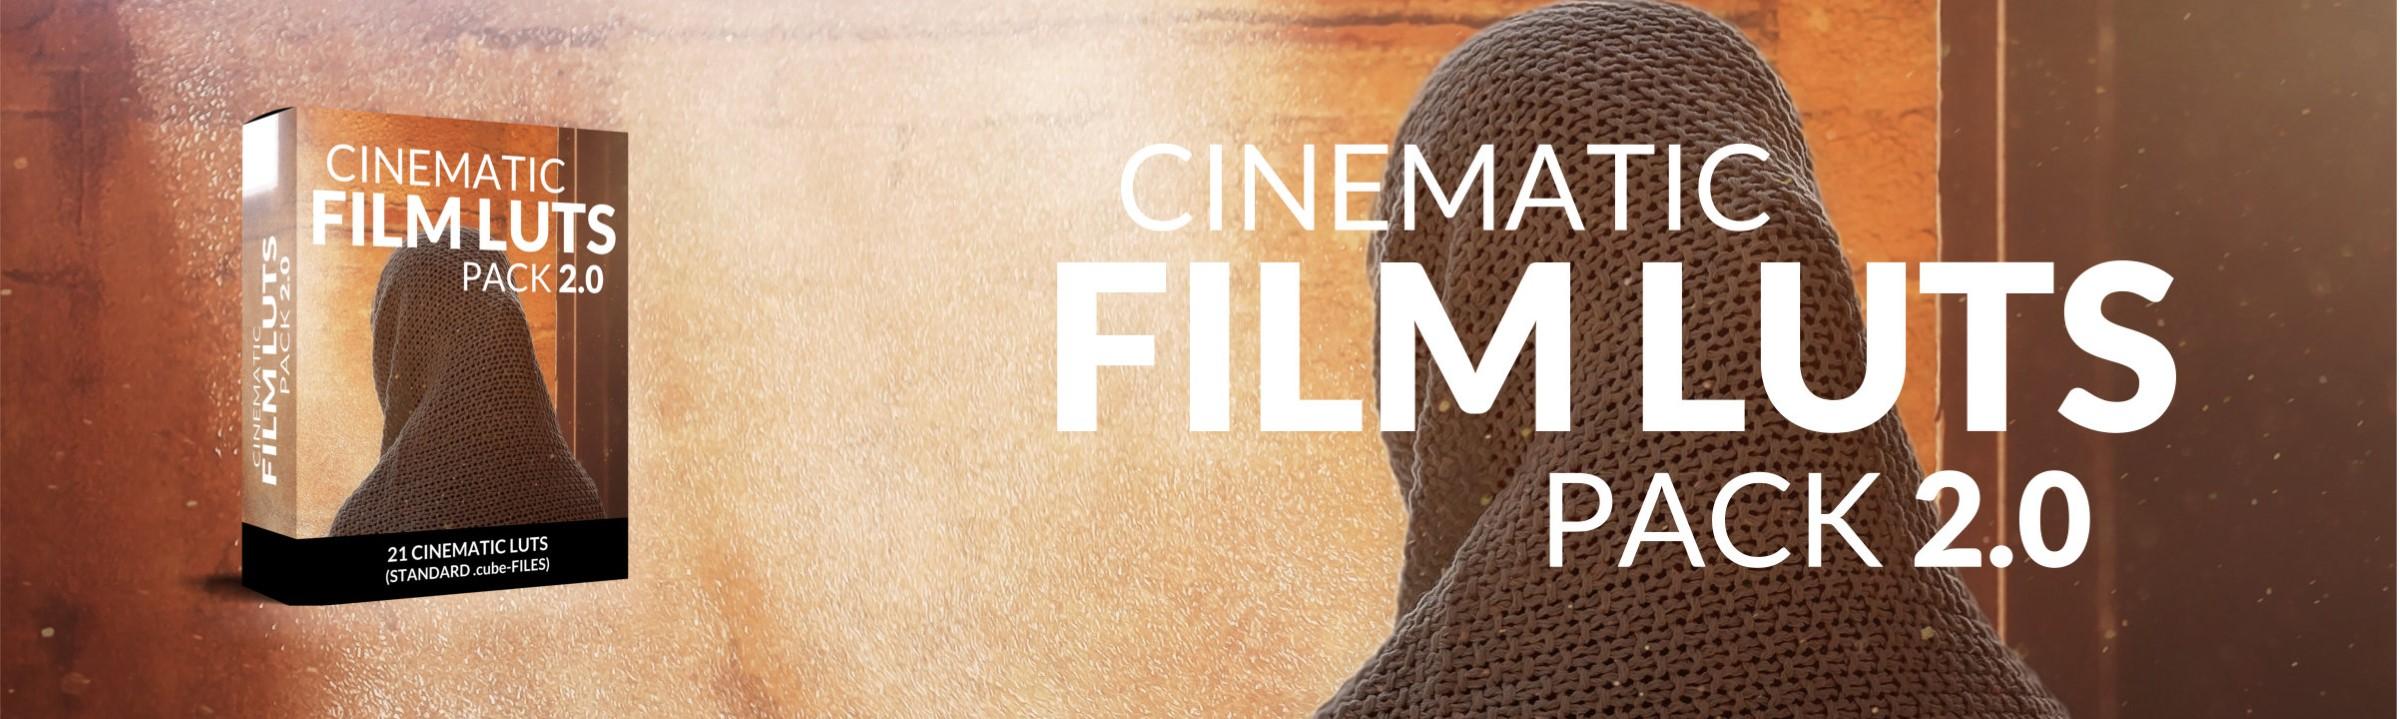 Cinematic LUTs Pack for Adobe Premiere Pro (Website Header)